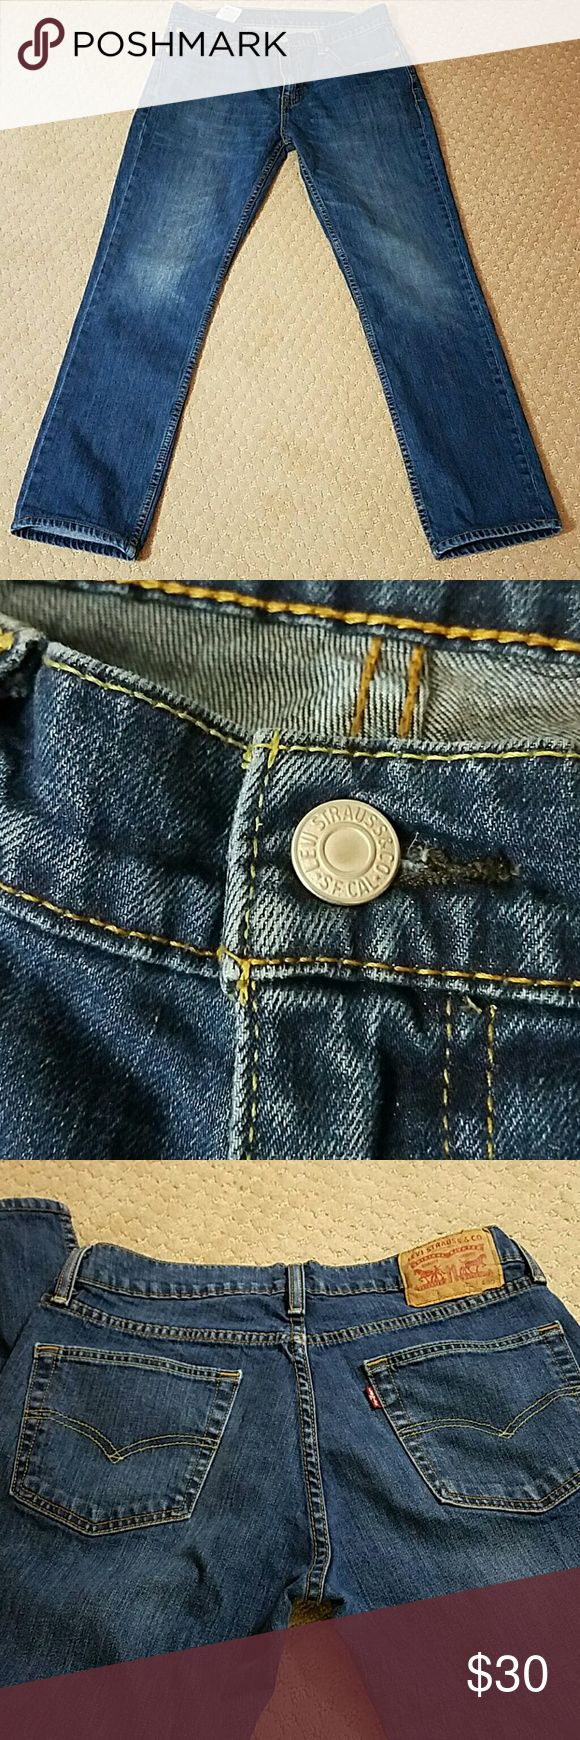 Levi's 511 jeans 33 x 30 Levi's 511 jeans 33 x 30 Levi's Jeans Straight